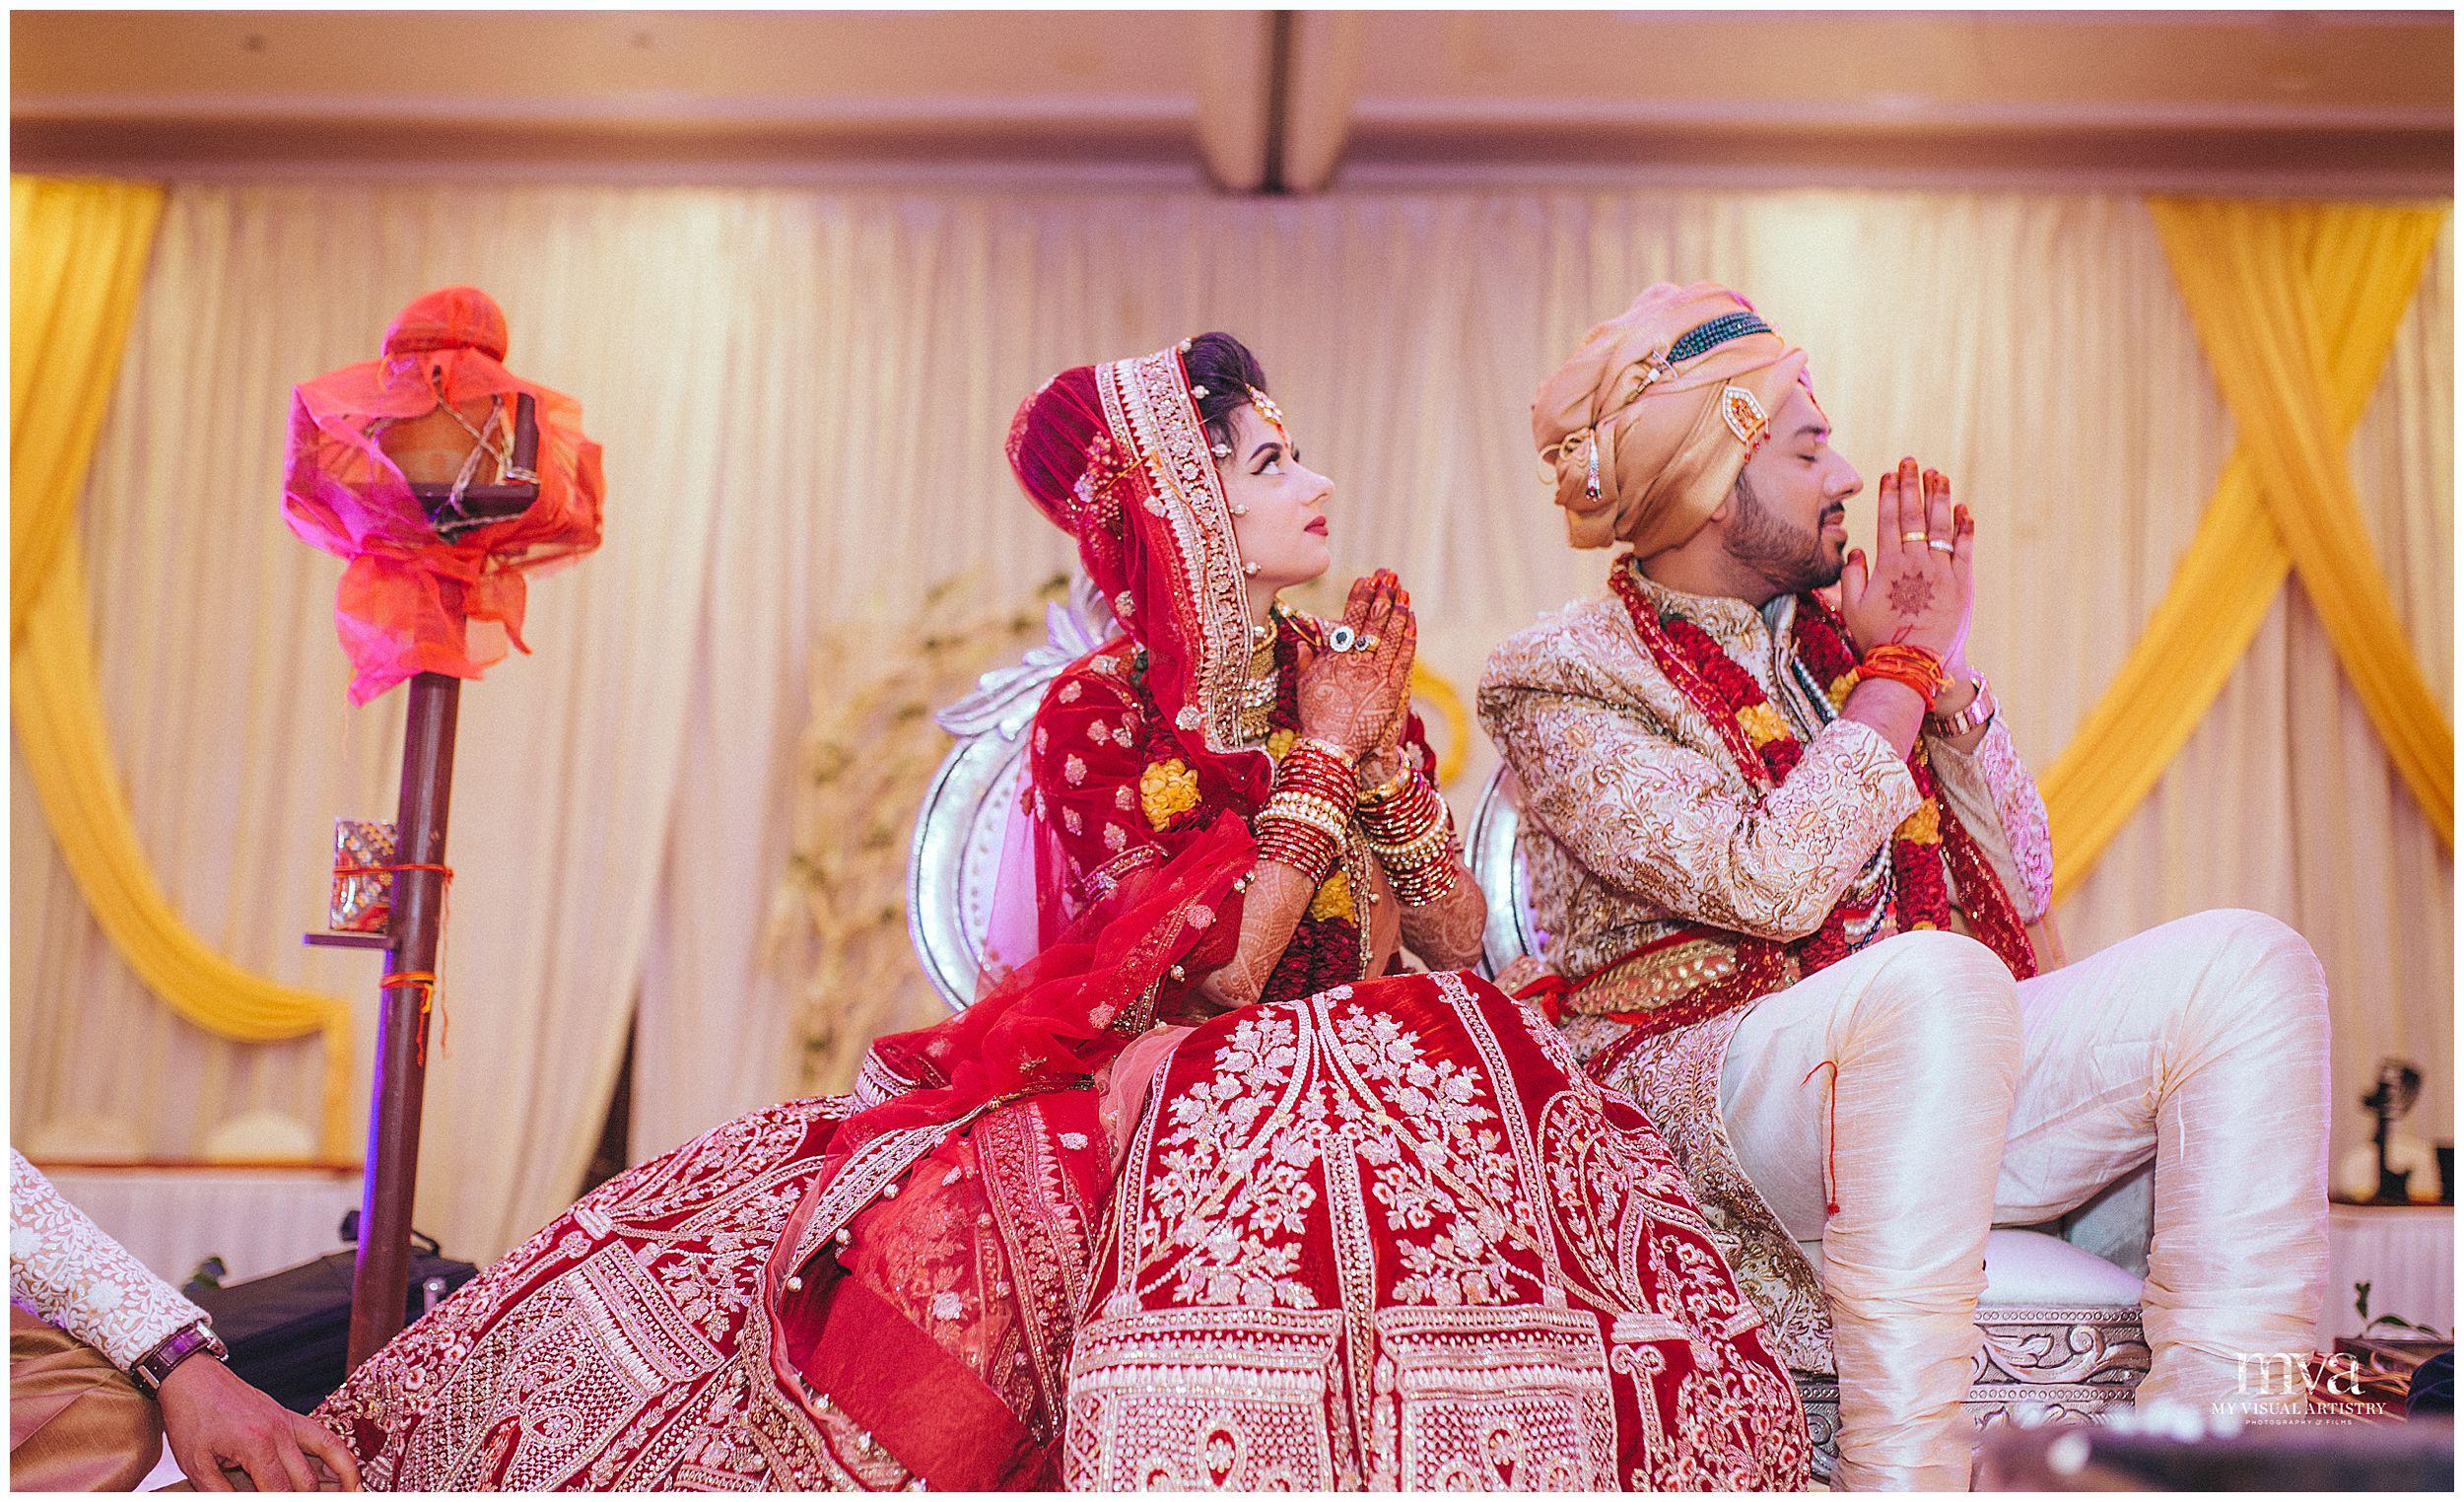 SONAAL_AMI_MYVISUALARTISTRY_WEDDING_PHOTOGRAPHY_MVA_NEPAL_KATHMANDU_SOALTEE64.jpg